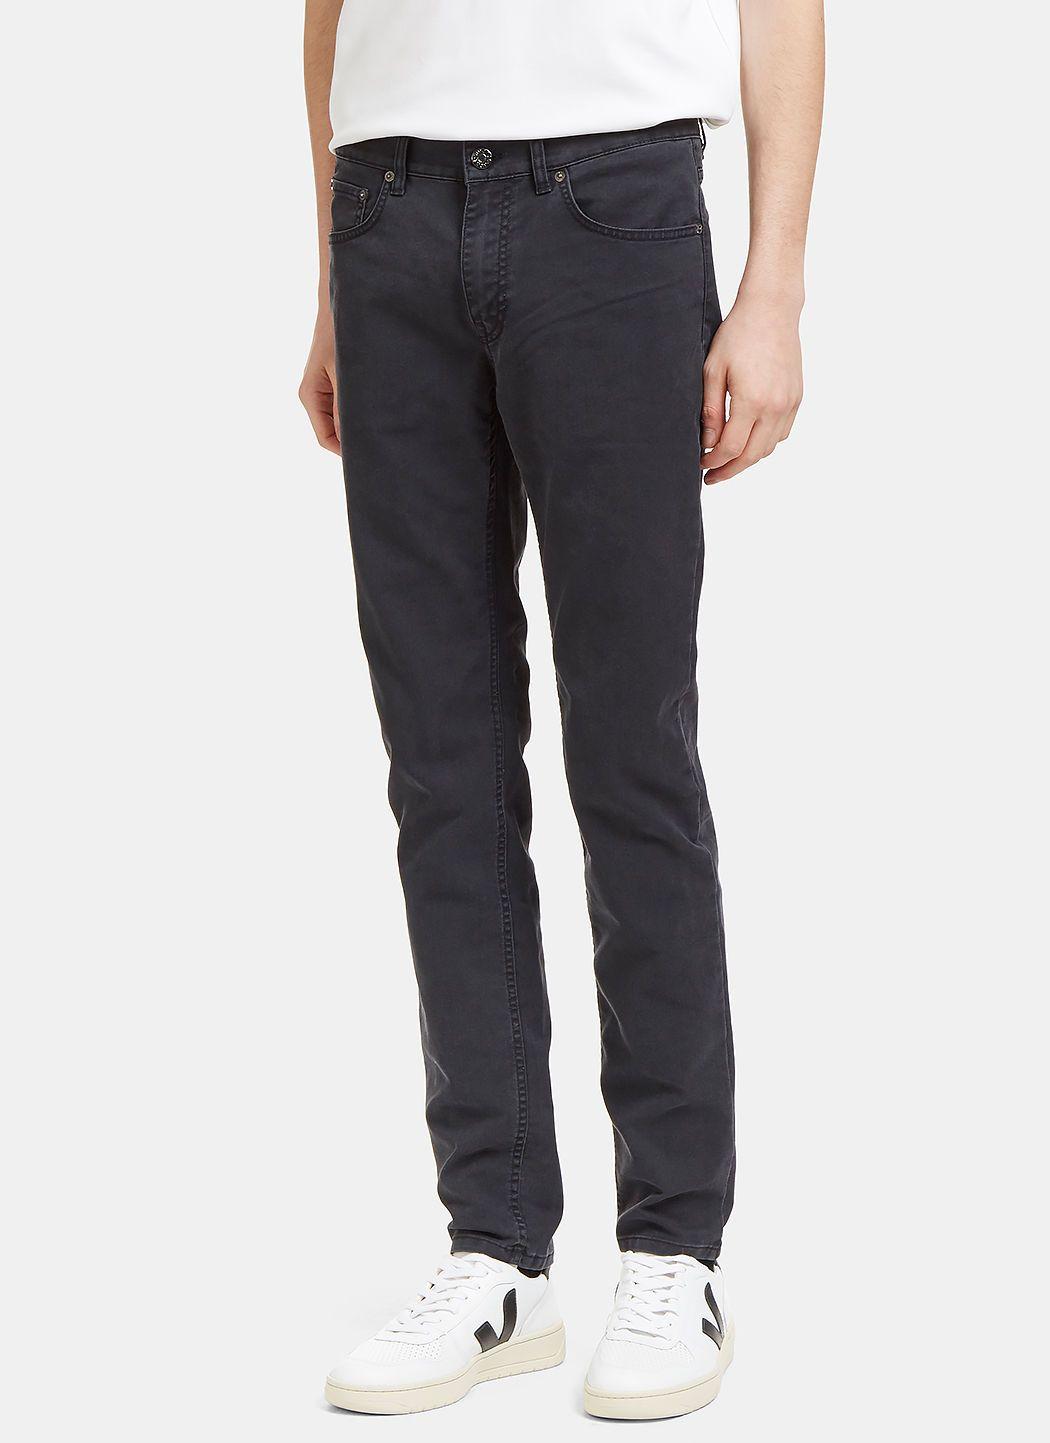 523f05623ba3 ACNE STUDIOS Men s Ace Ups Skinny Leg Jeans in Charcoal.  acnestudios   cloth